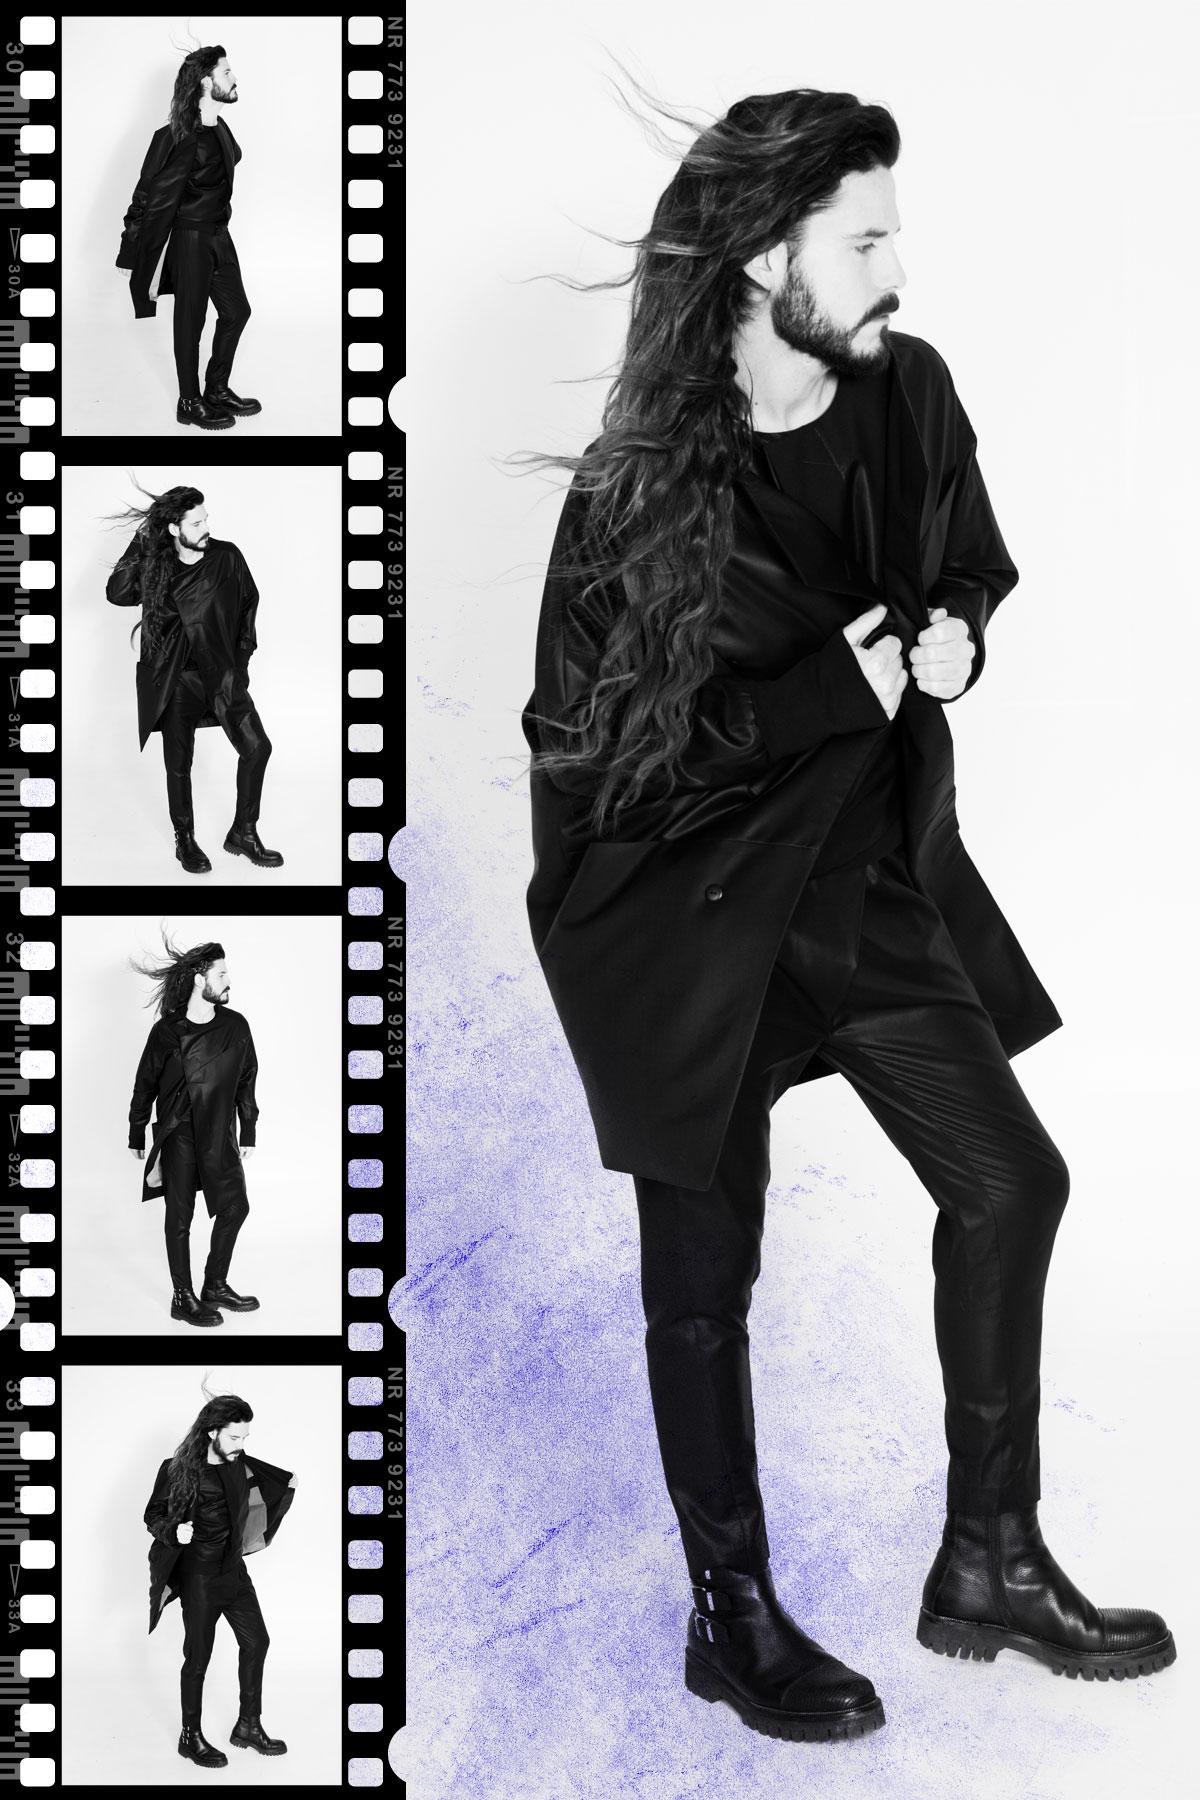 Editorial-Aleks-Kurkowski-Malefashion-Designer-Mode-High-Fashion-Avantgarde-Menswear-07